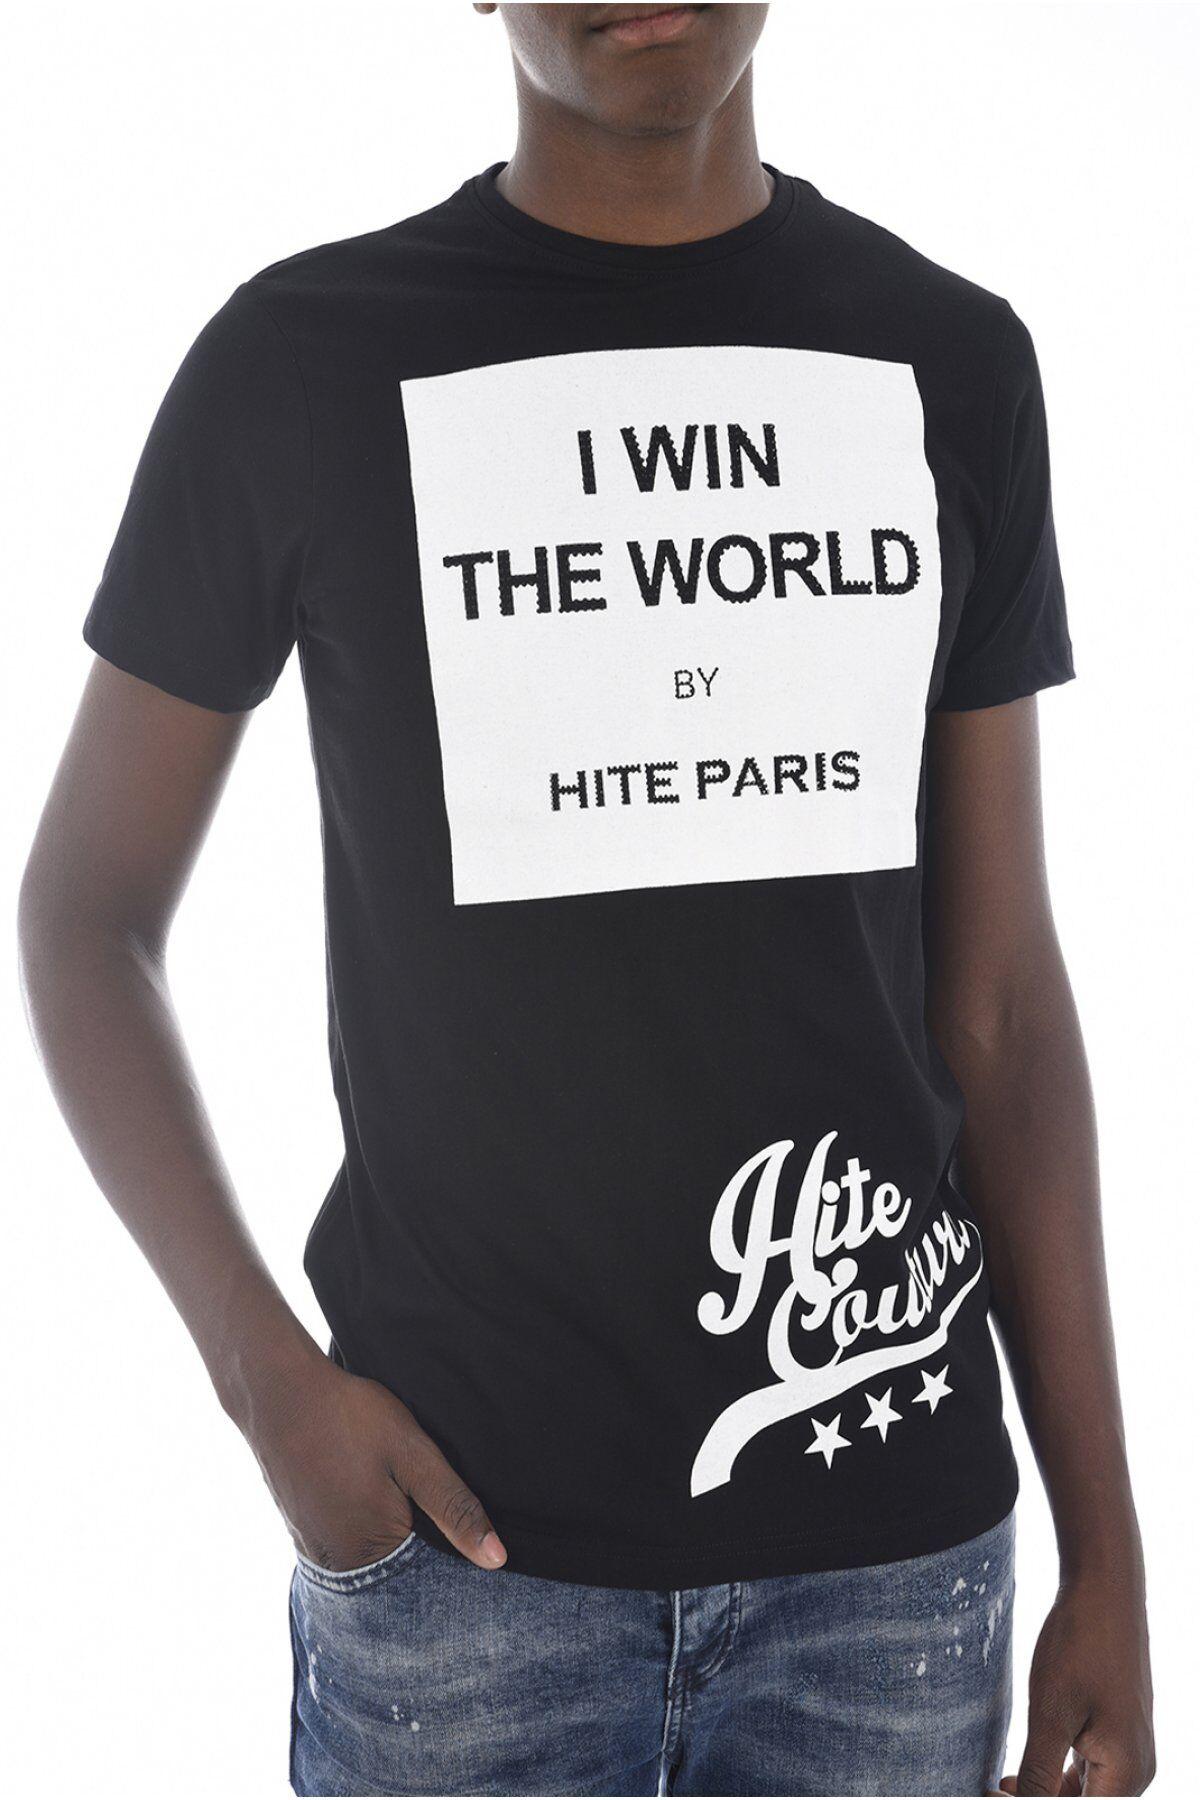 Hite couture Tee Shirt Coton Printé & Strassé Meriver  -  Hite Couture